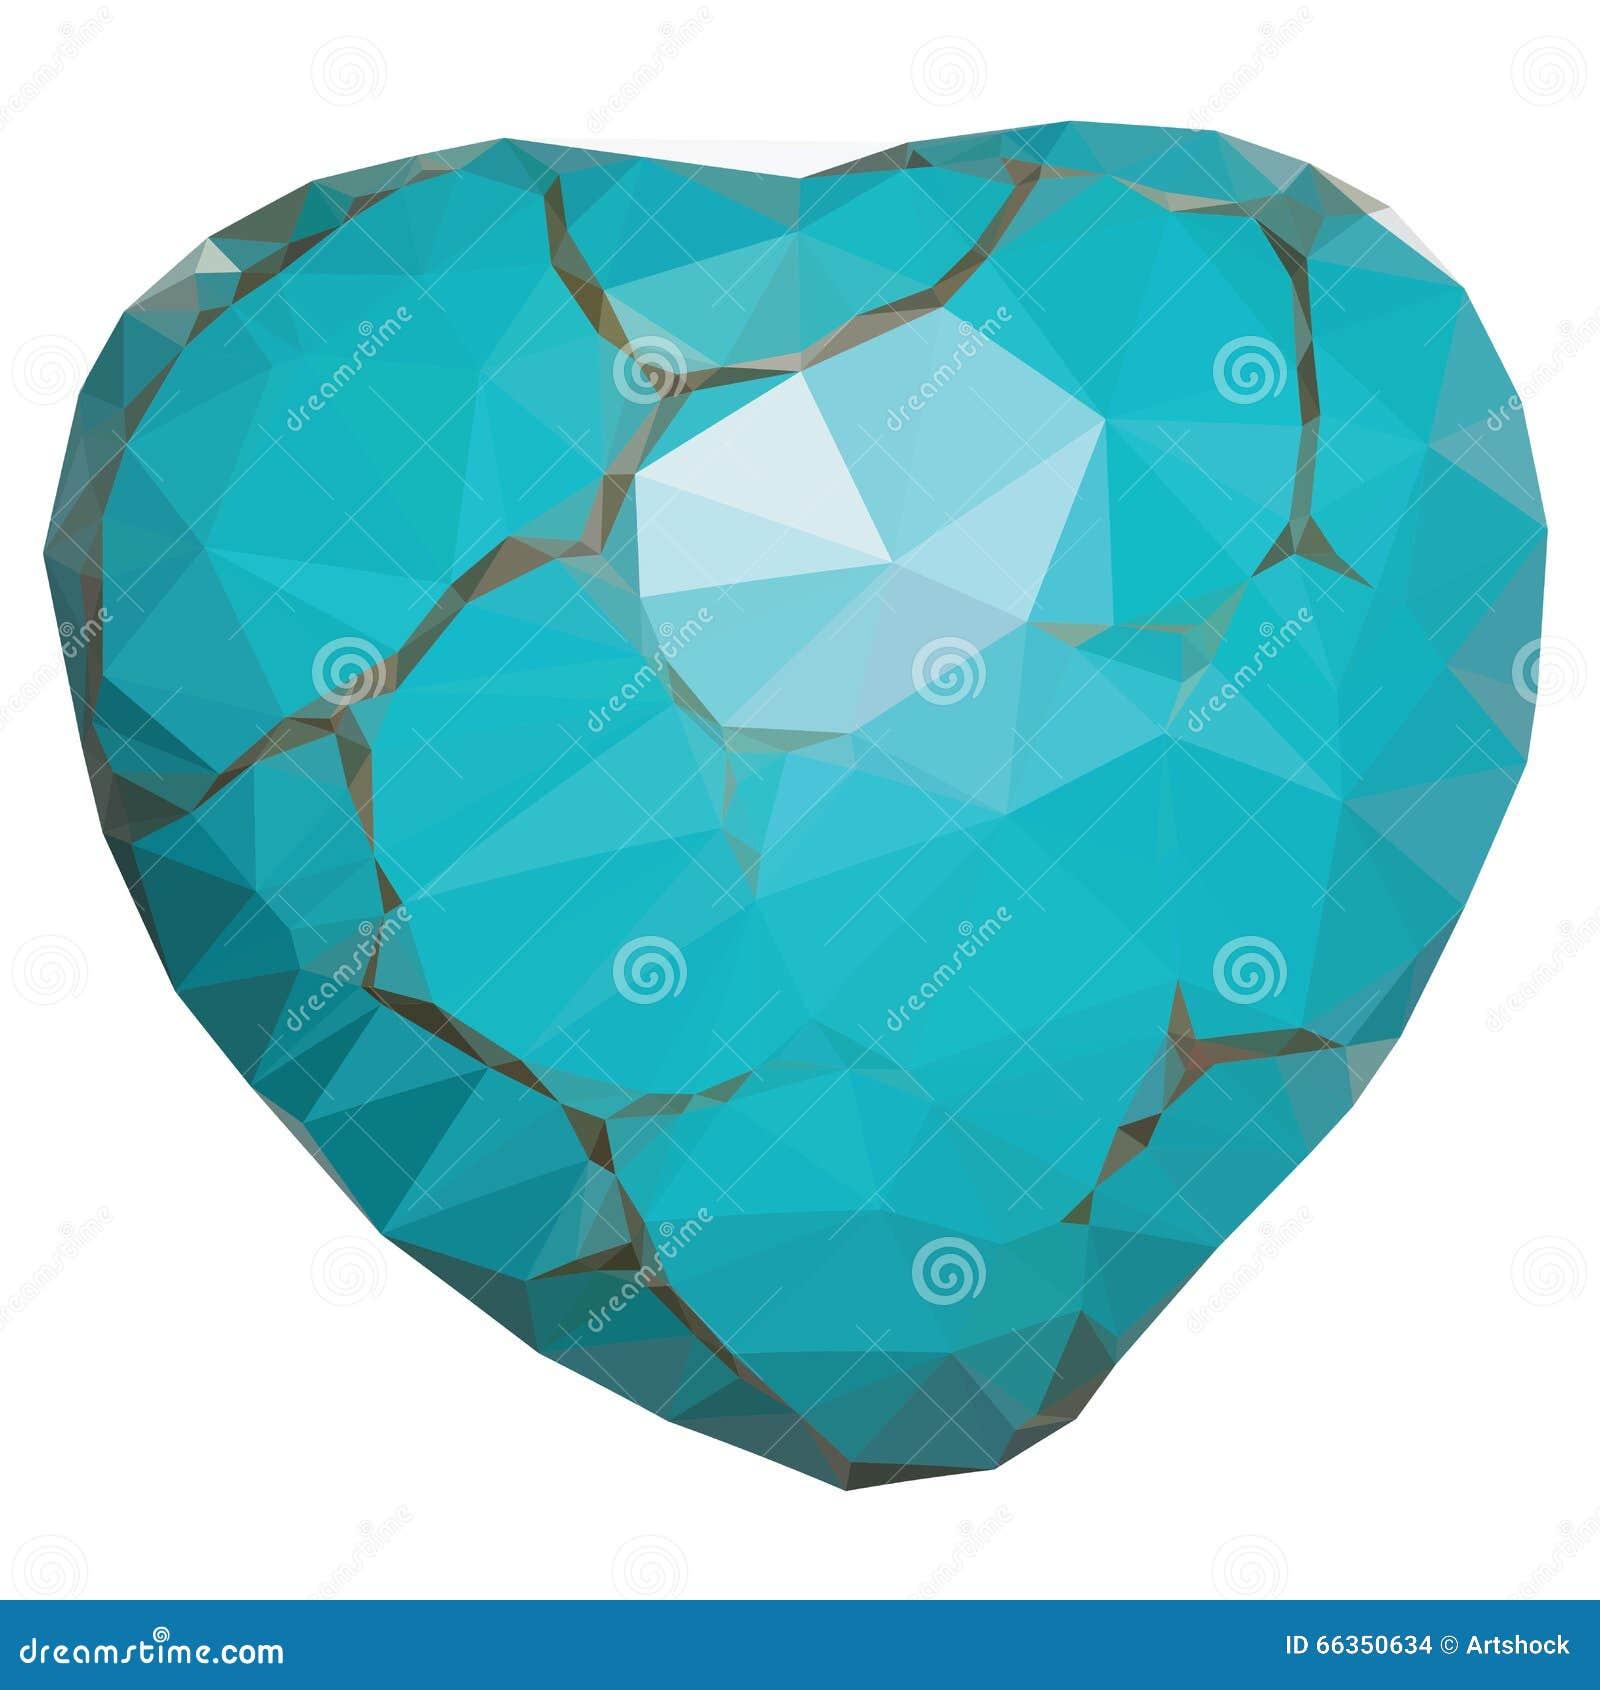 geometric turquoise heart stock vector illustration of